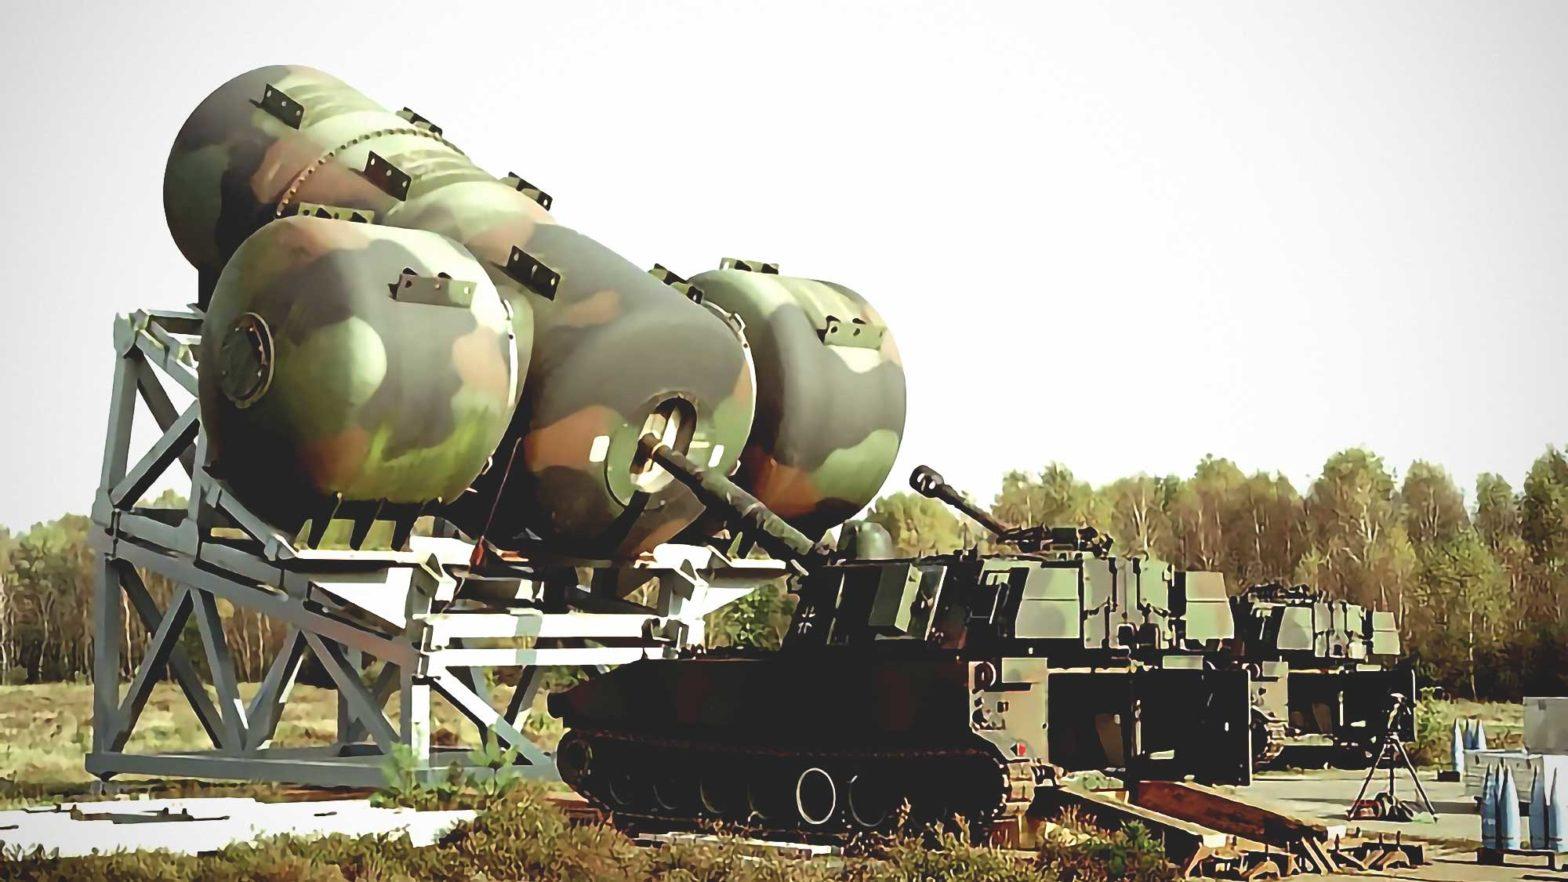 Germany Army Howitzer Gun Suppressor